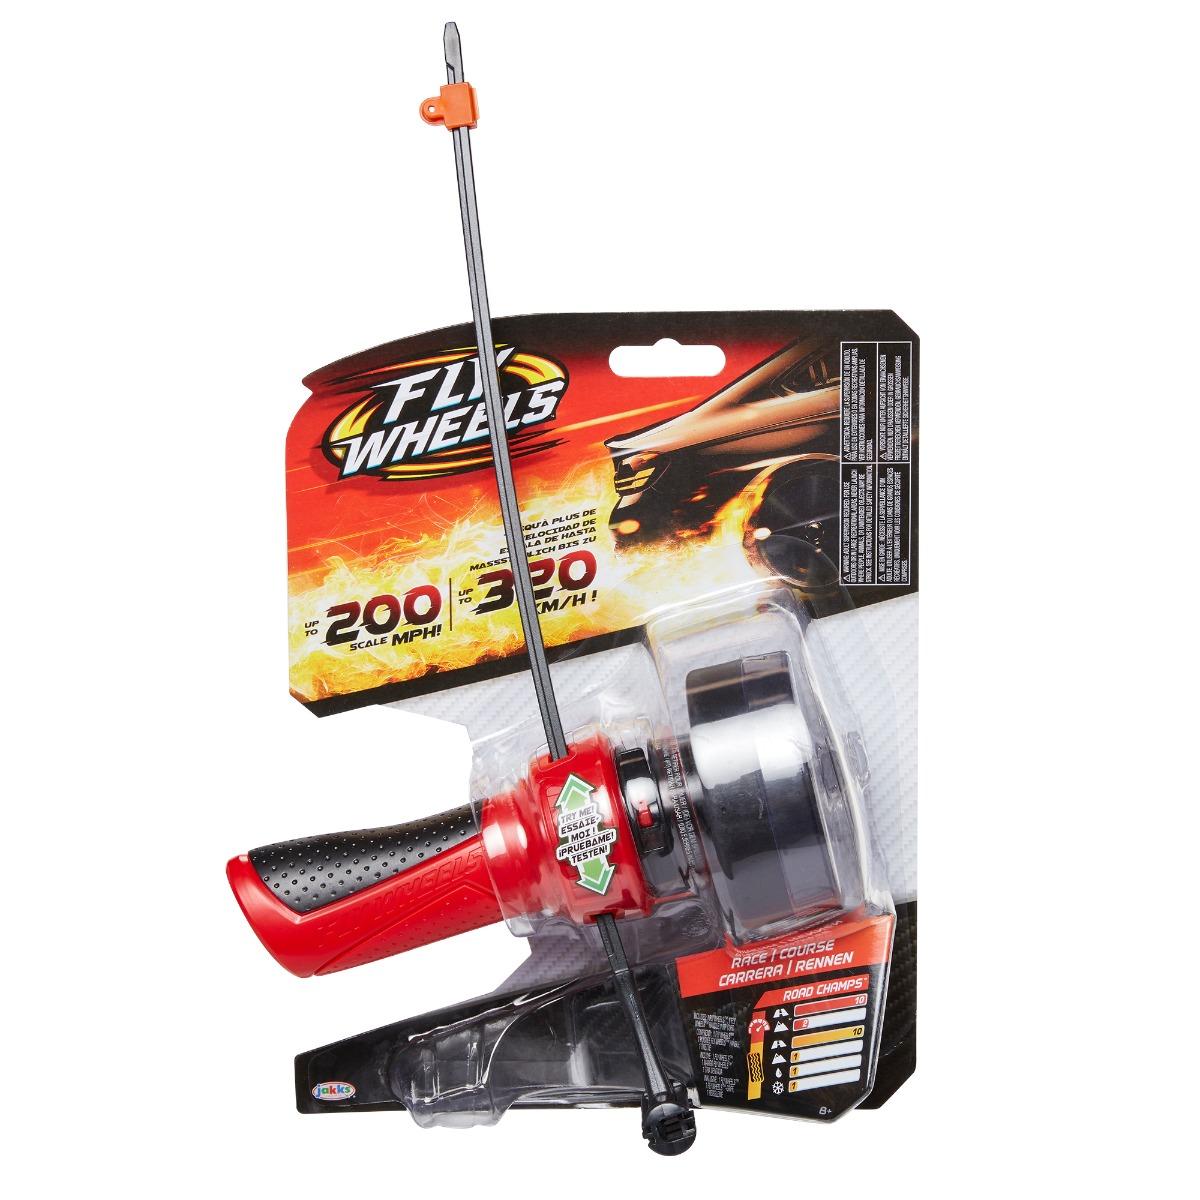 Lansator Fly Wheels, Race Wheel 15147I